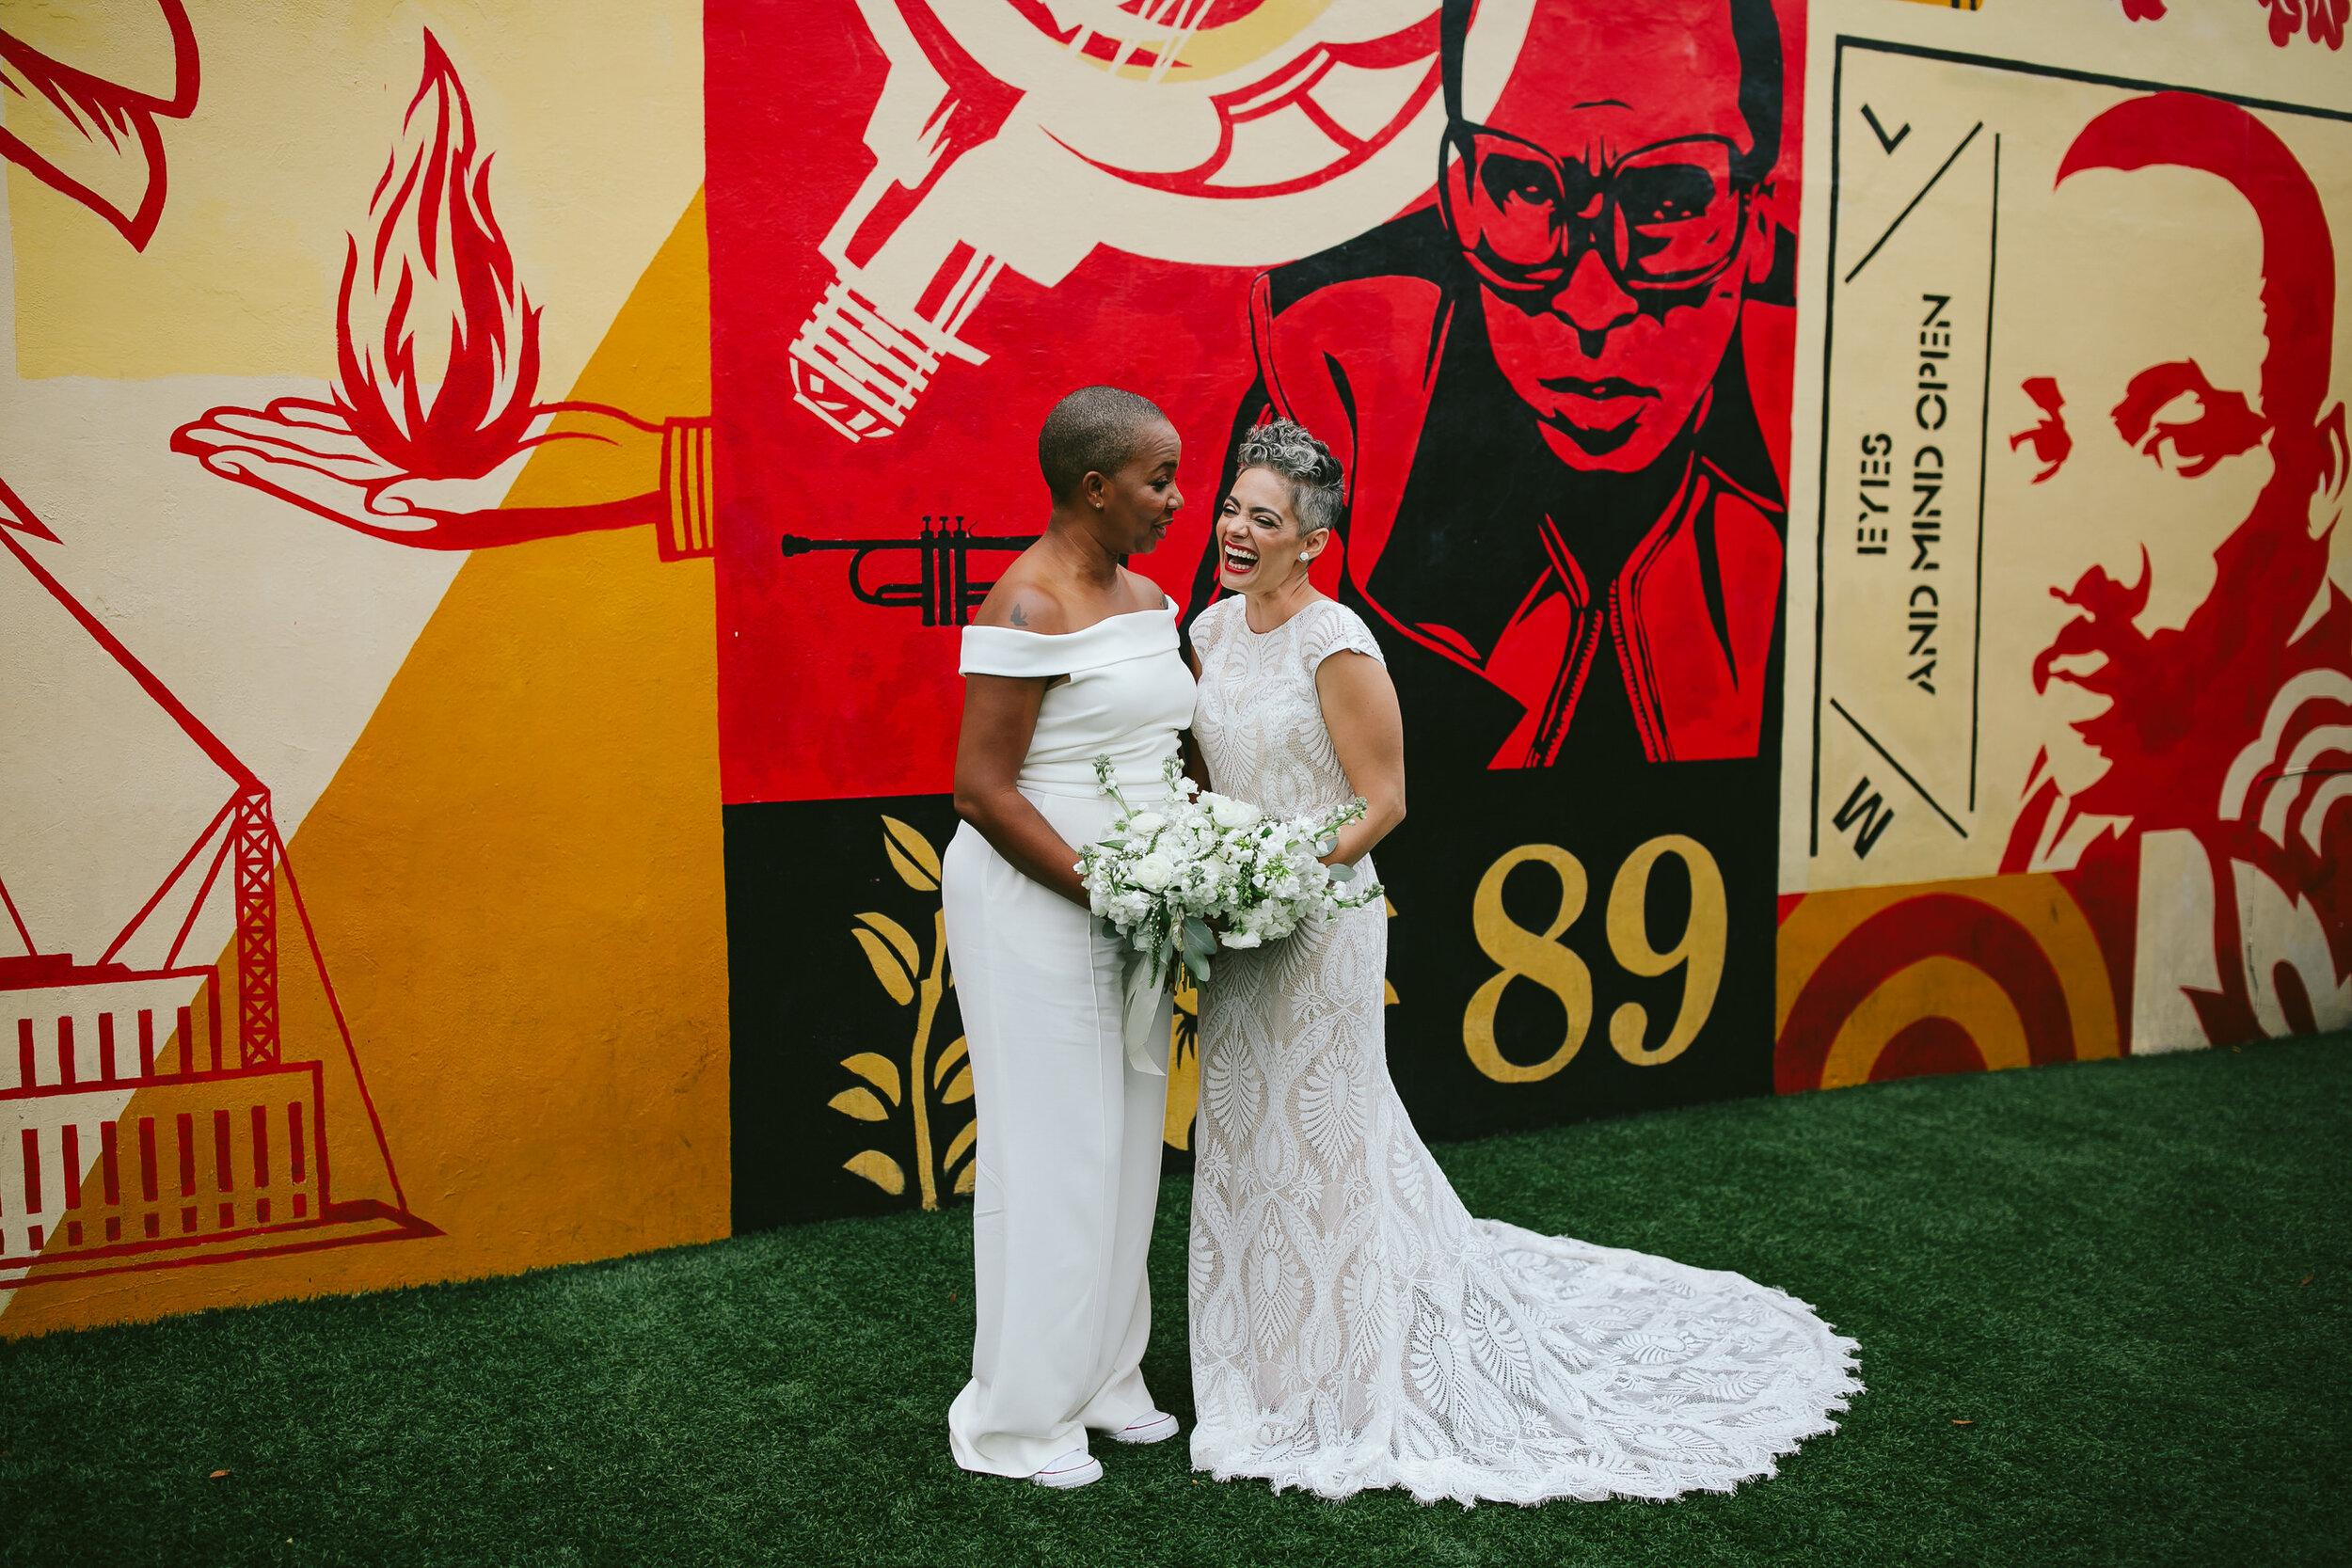 Brides Laughing Wynwood Walls Miami